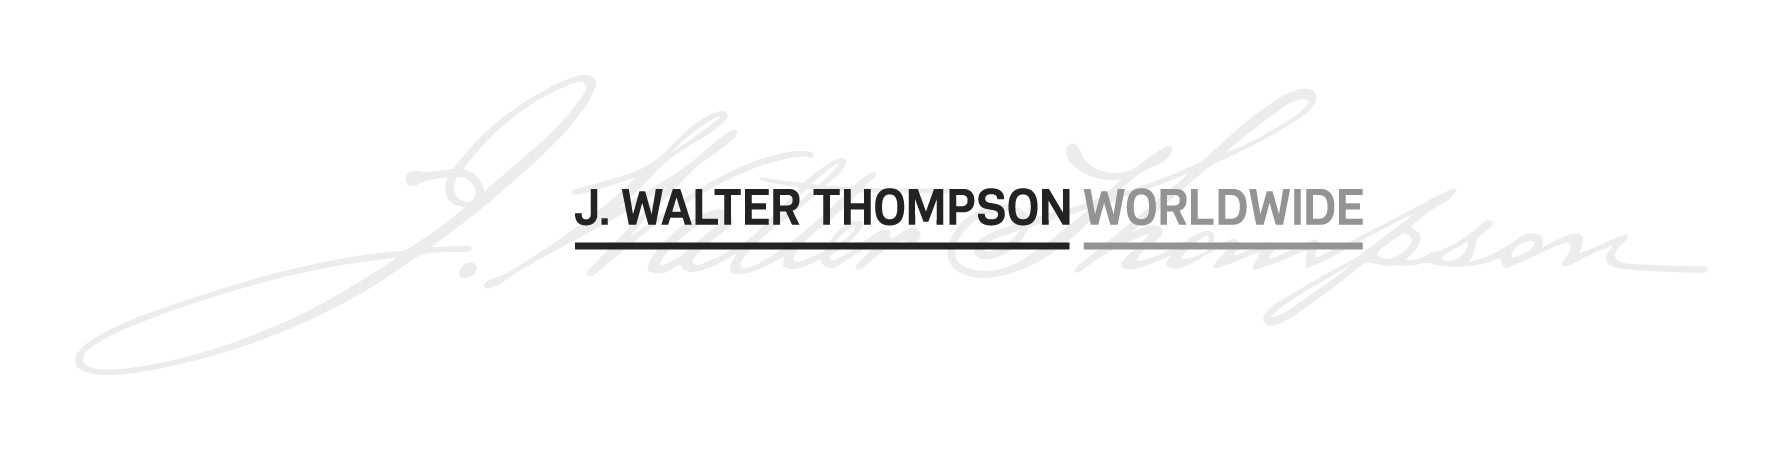 j-walter-thompson-jwt-logo-horizontal-white.jpg